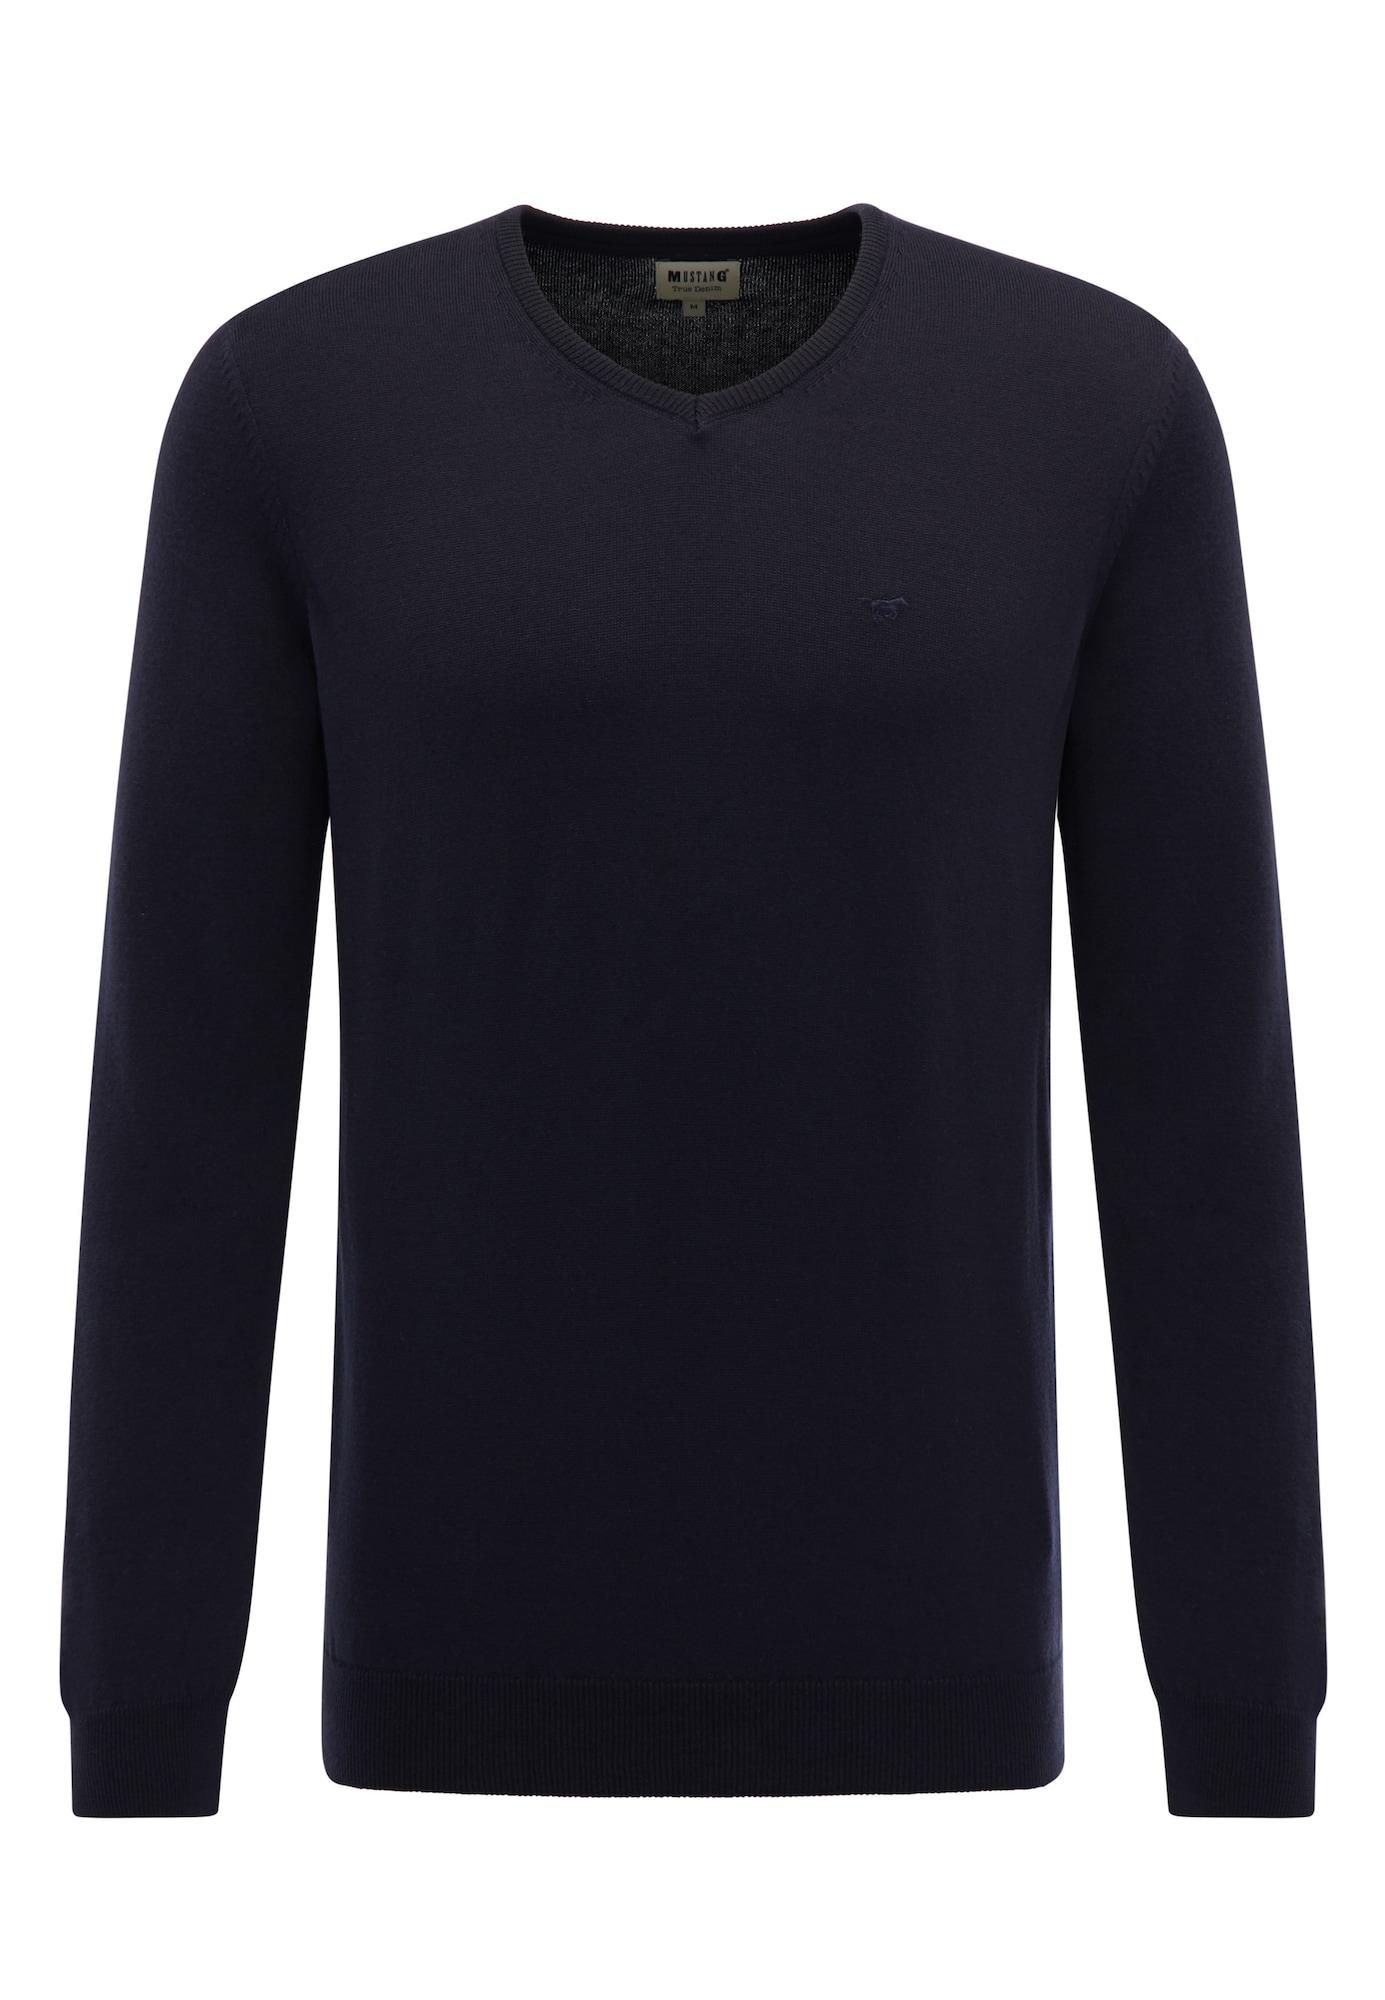 MUSTANG Megztinis tamsiai mėlyna